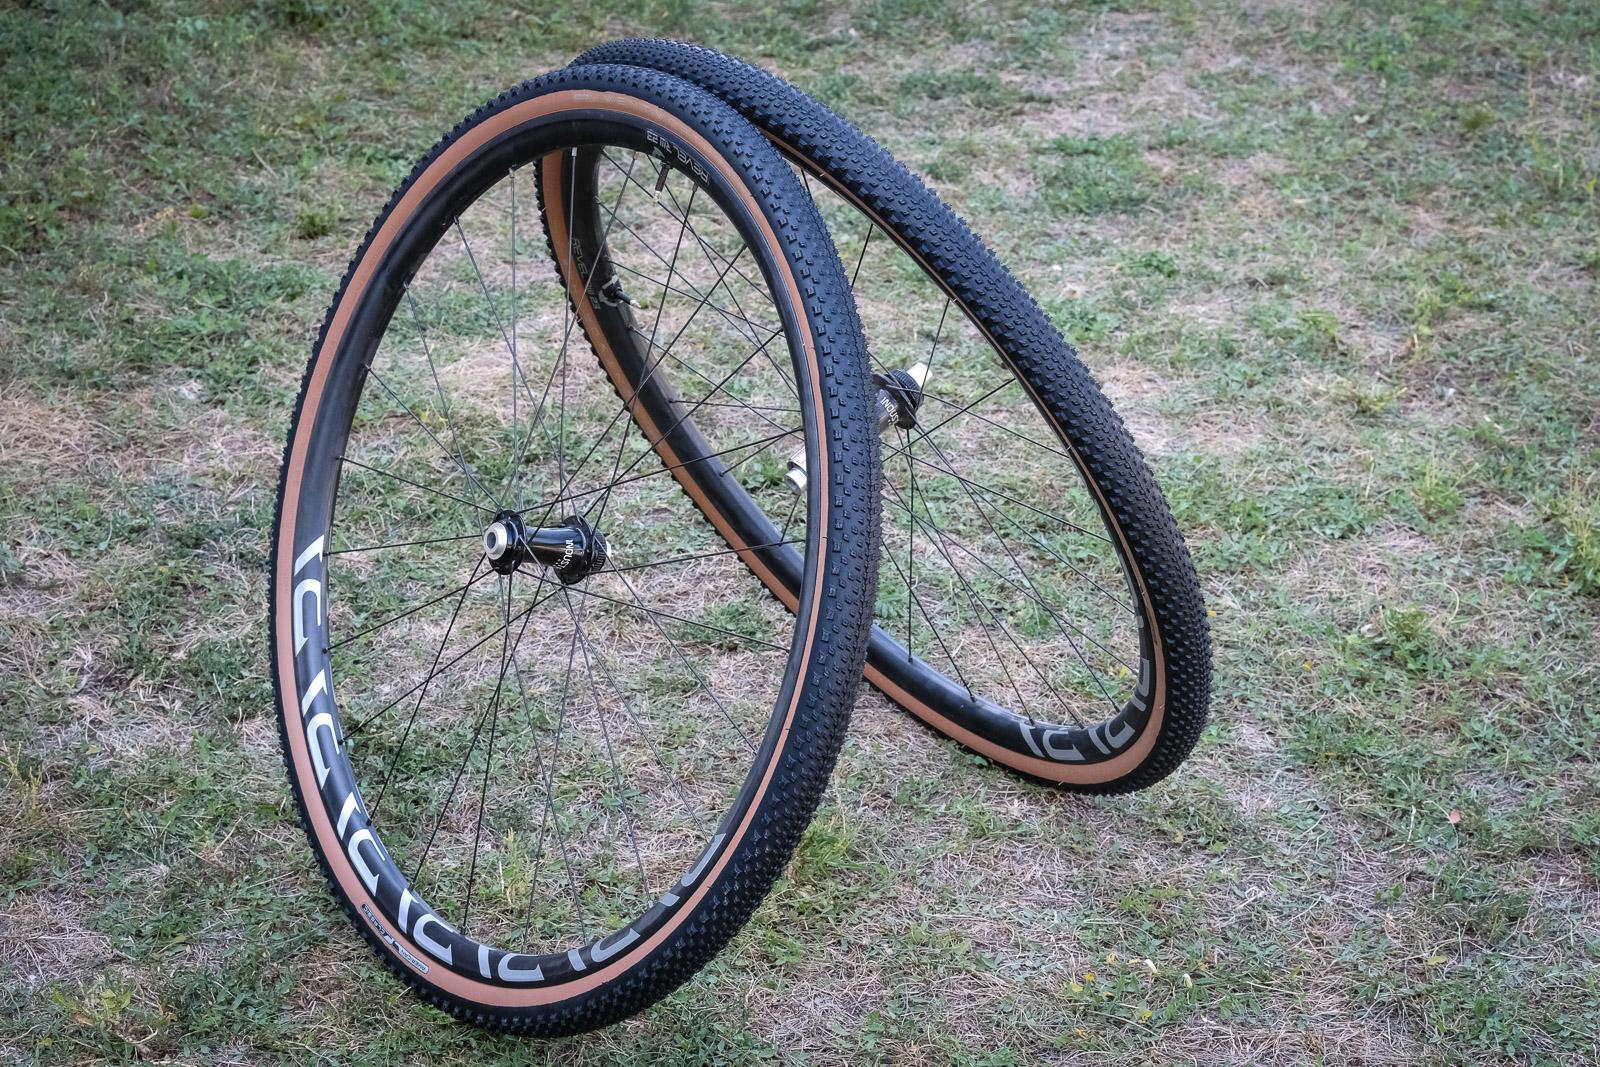 American Classic gravel tires